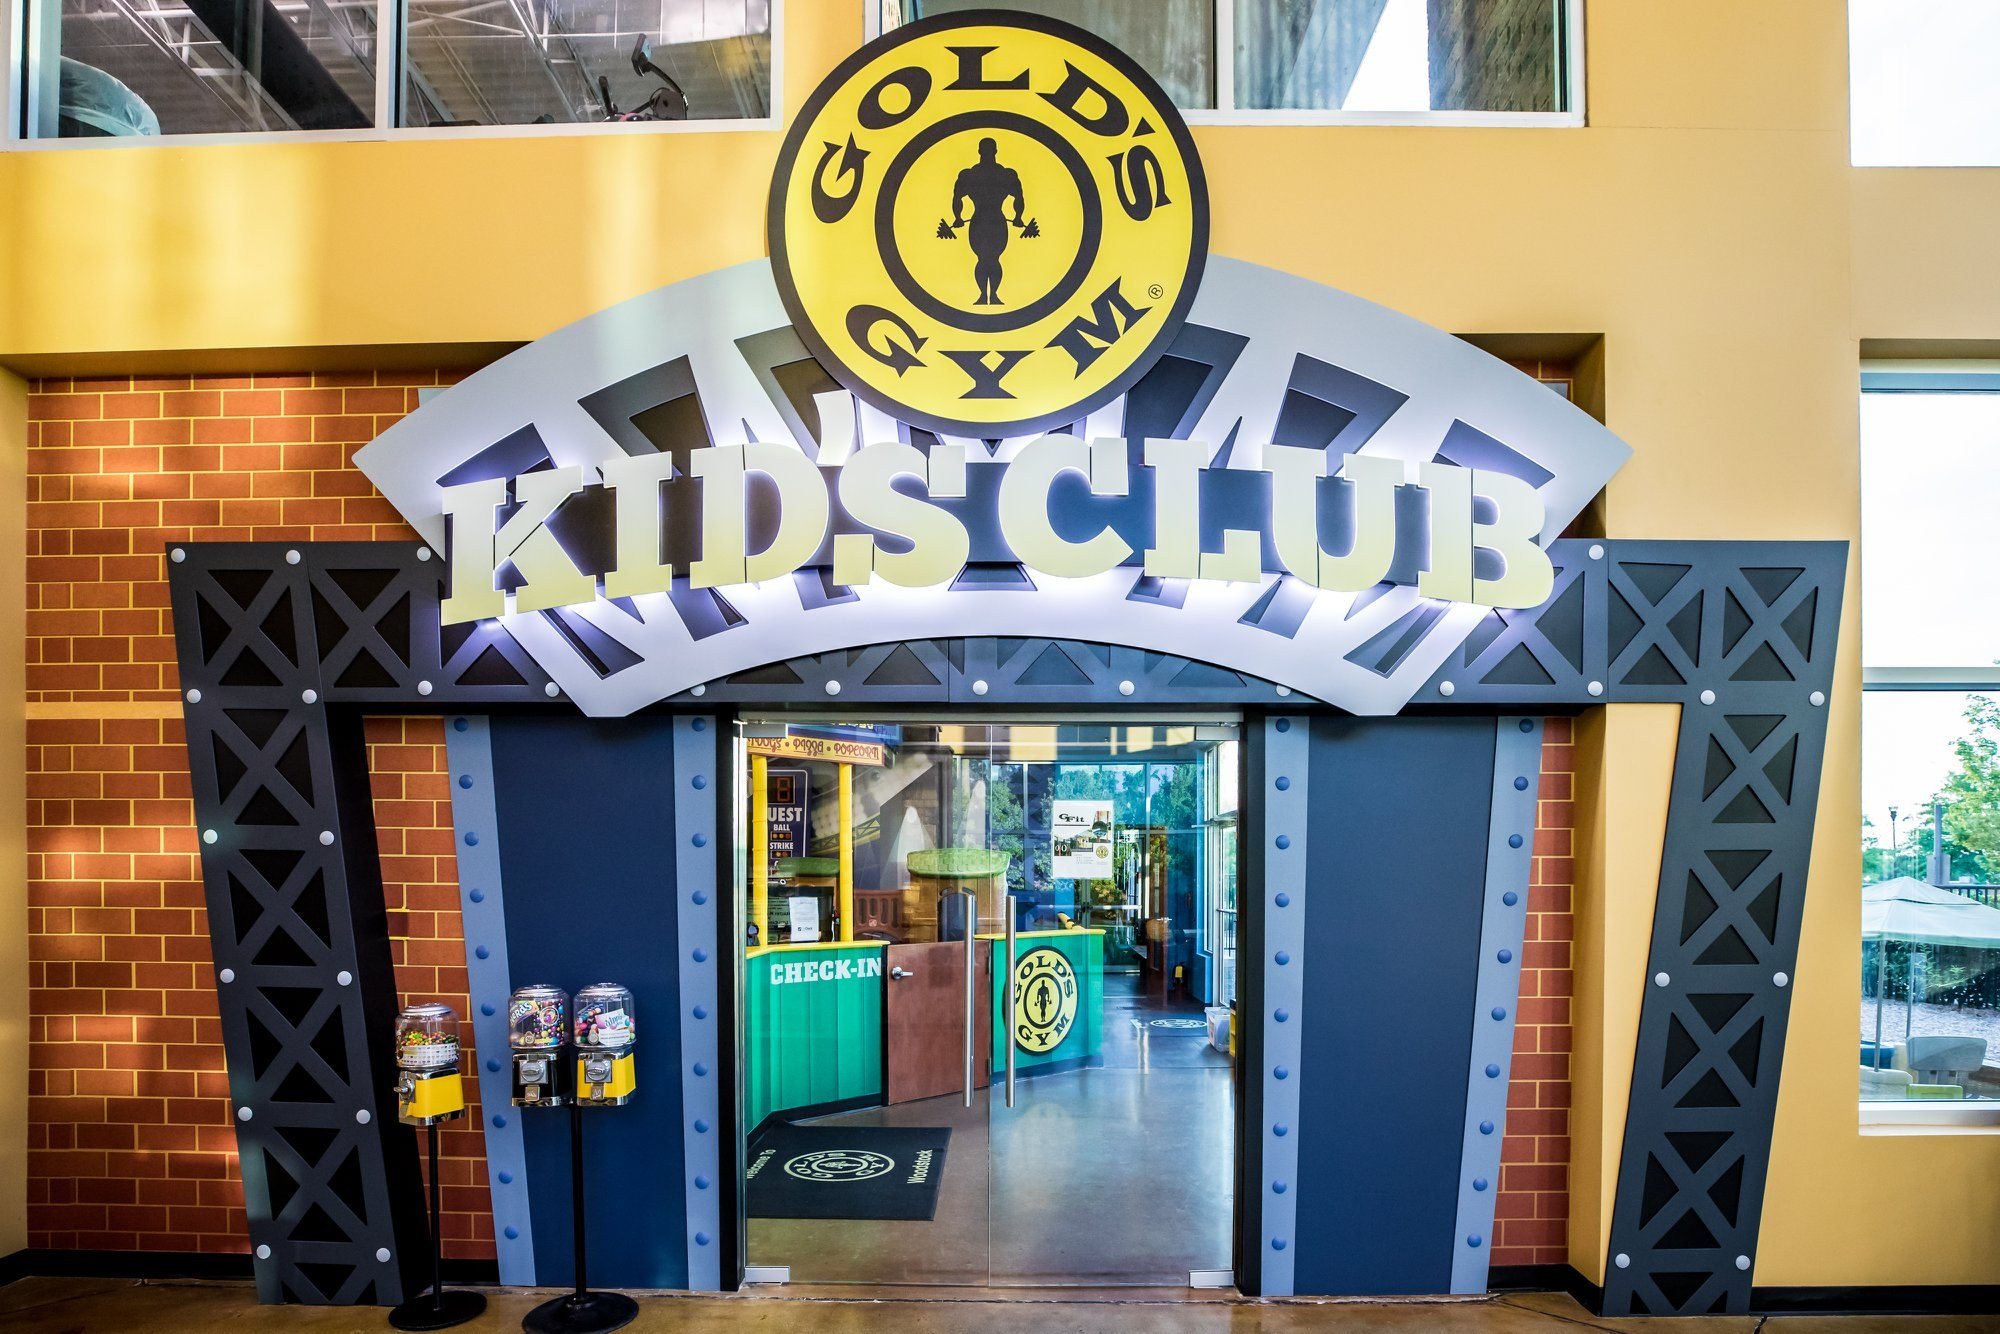 Gold's Gym kid's club